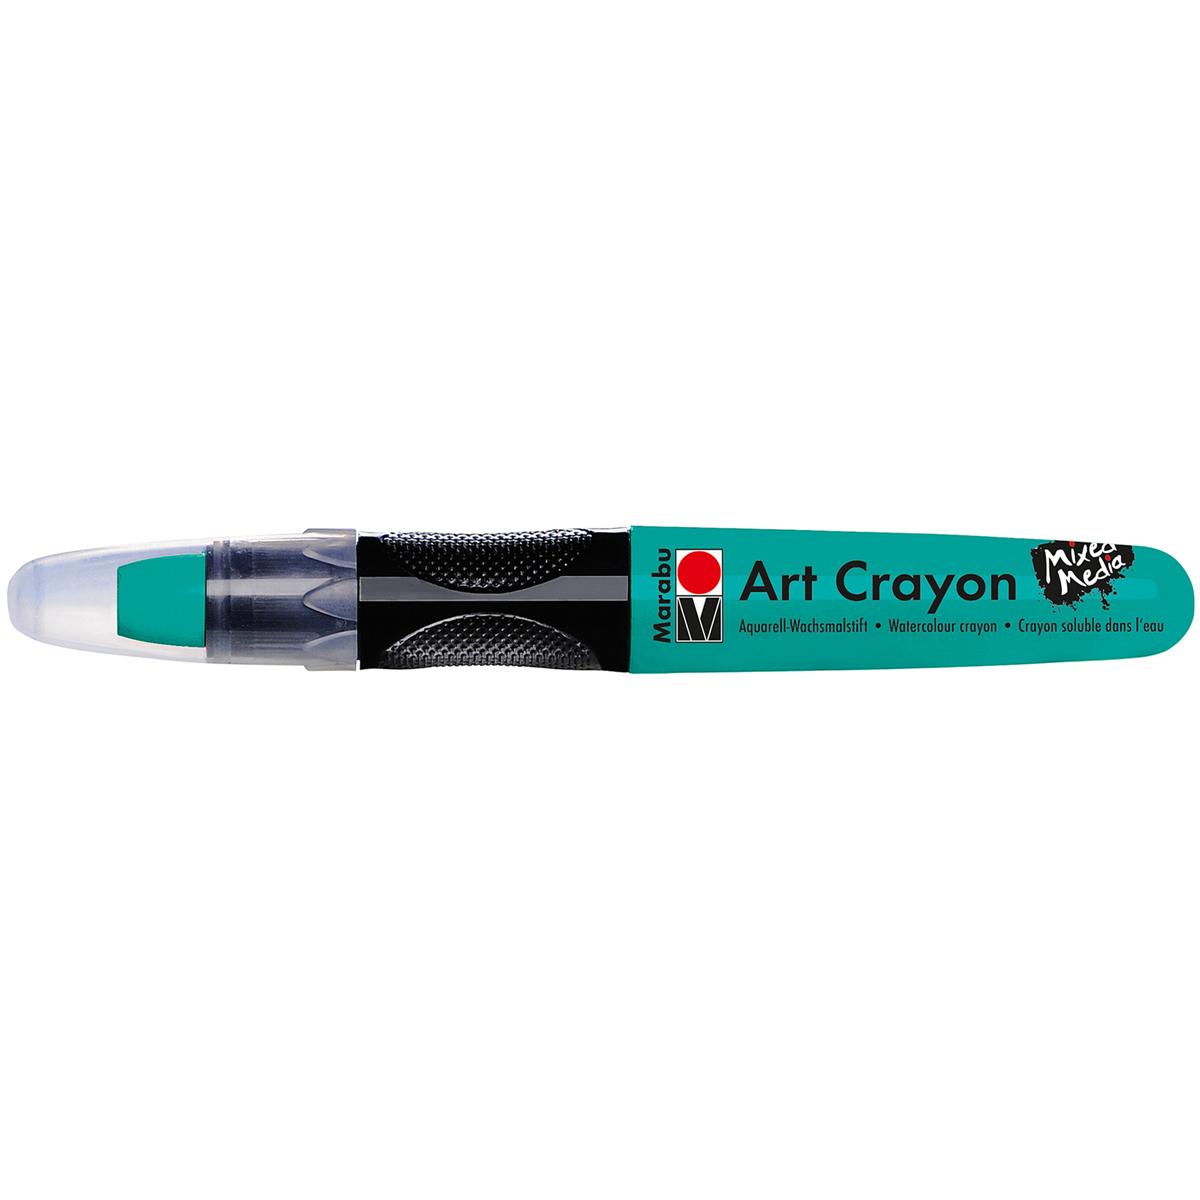 Marabu Creative Art Crayons-Aqua Green